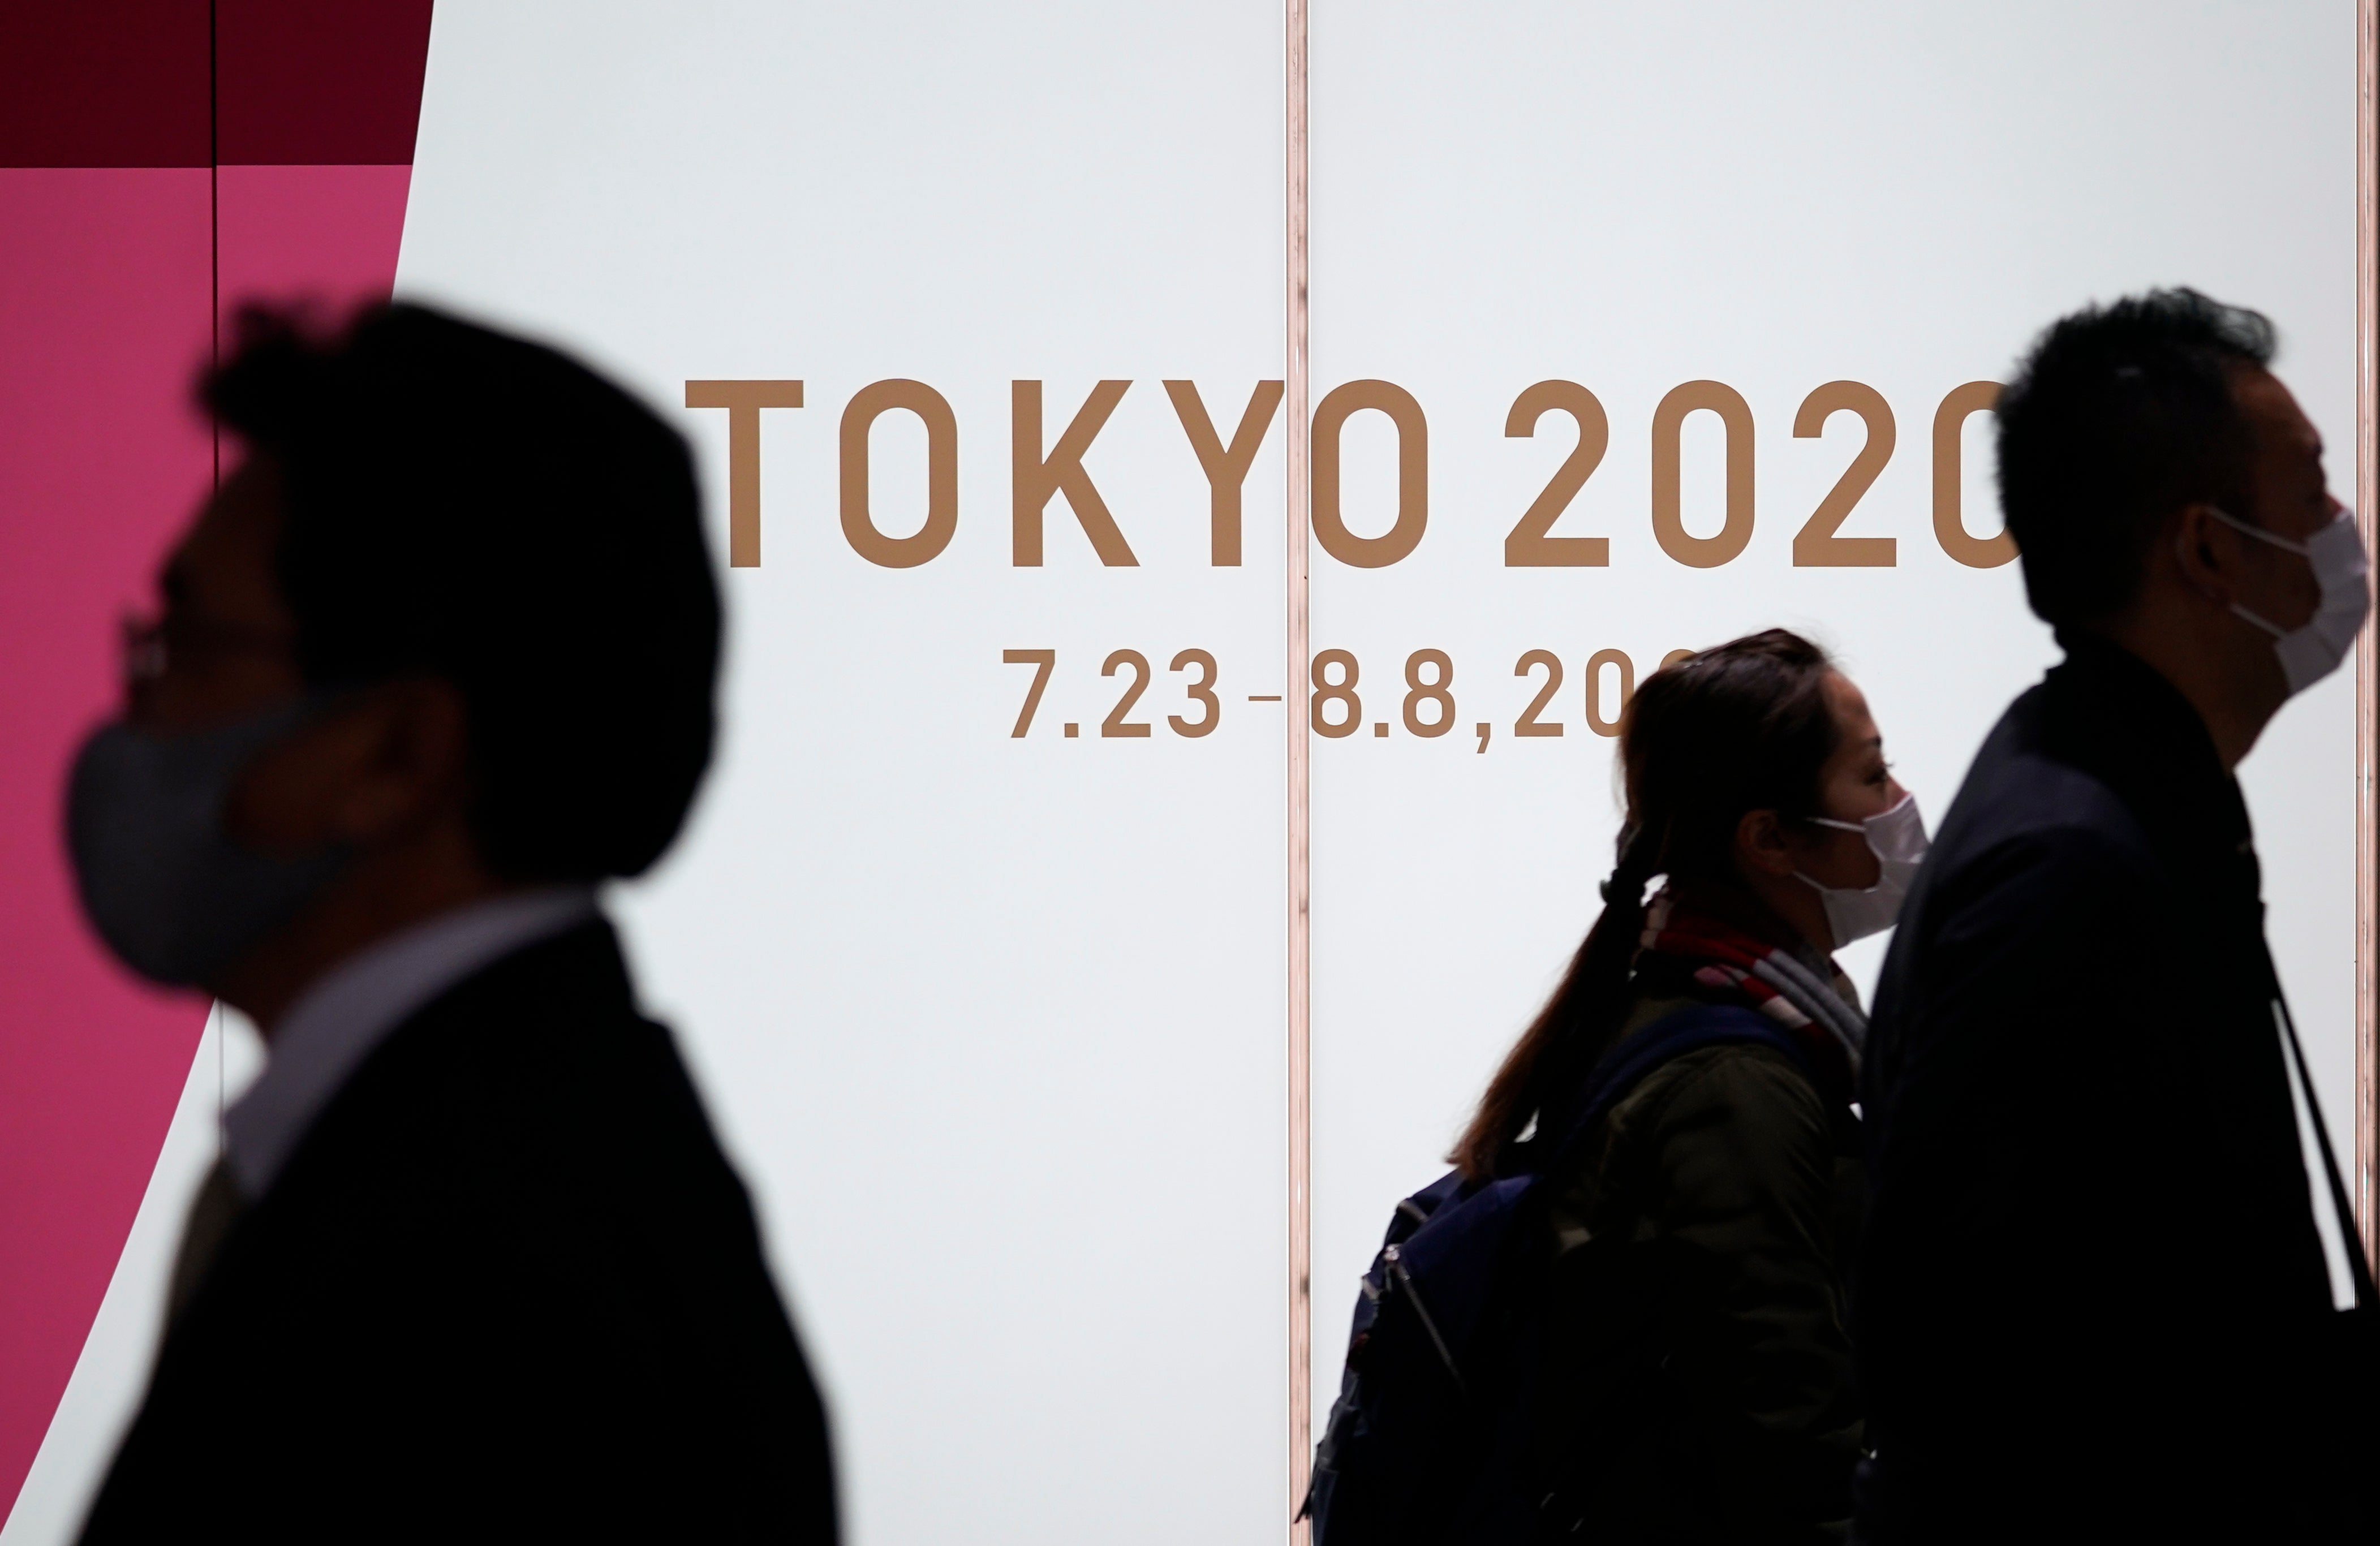 Coronavirus pandemic has cost postponed Tokyo 2020 Olympics Games £1.4bn